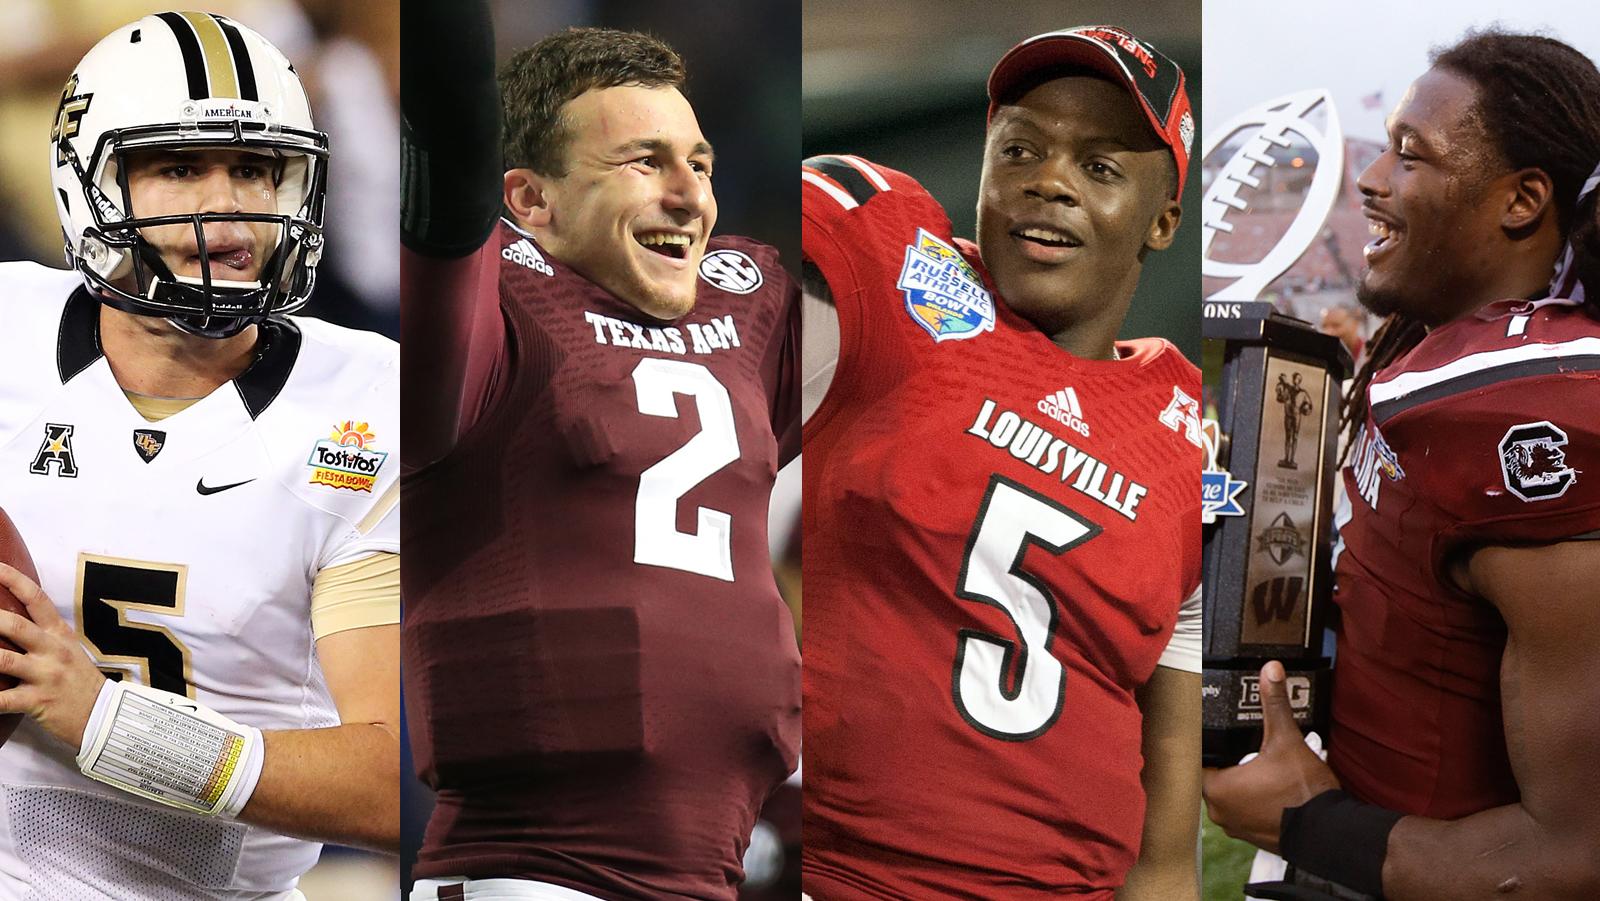 NFL Draft prospects 2015